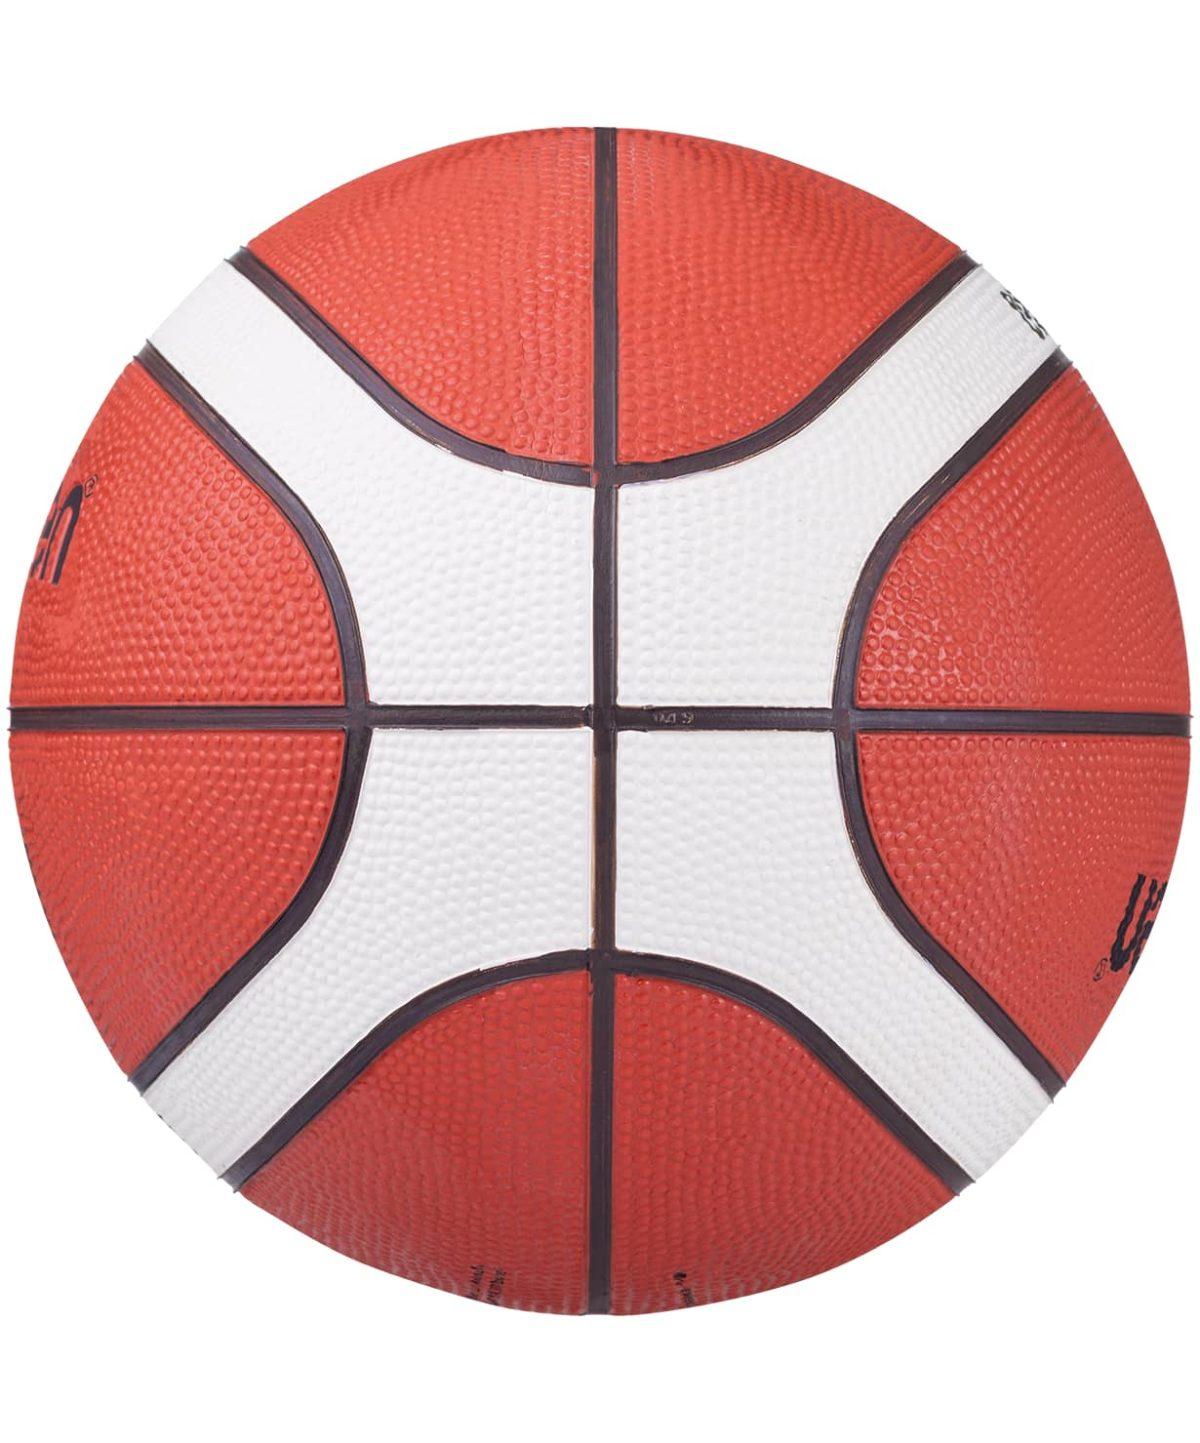 MOLTEN Мяч баскетбольный  B7G2000 №7 - 3